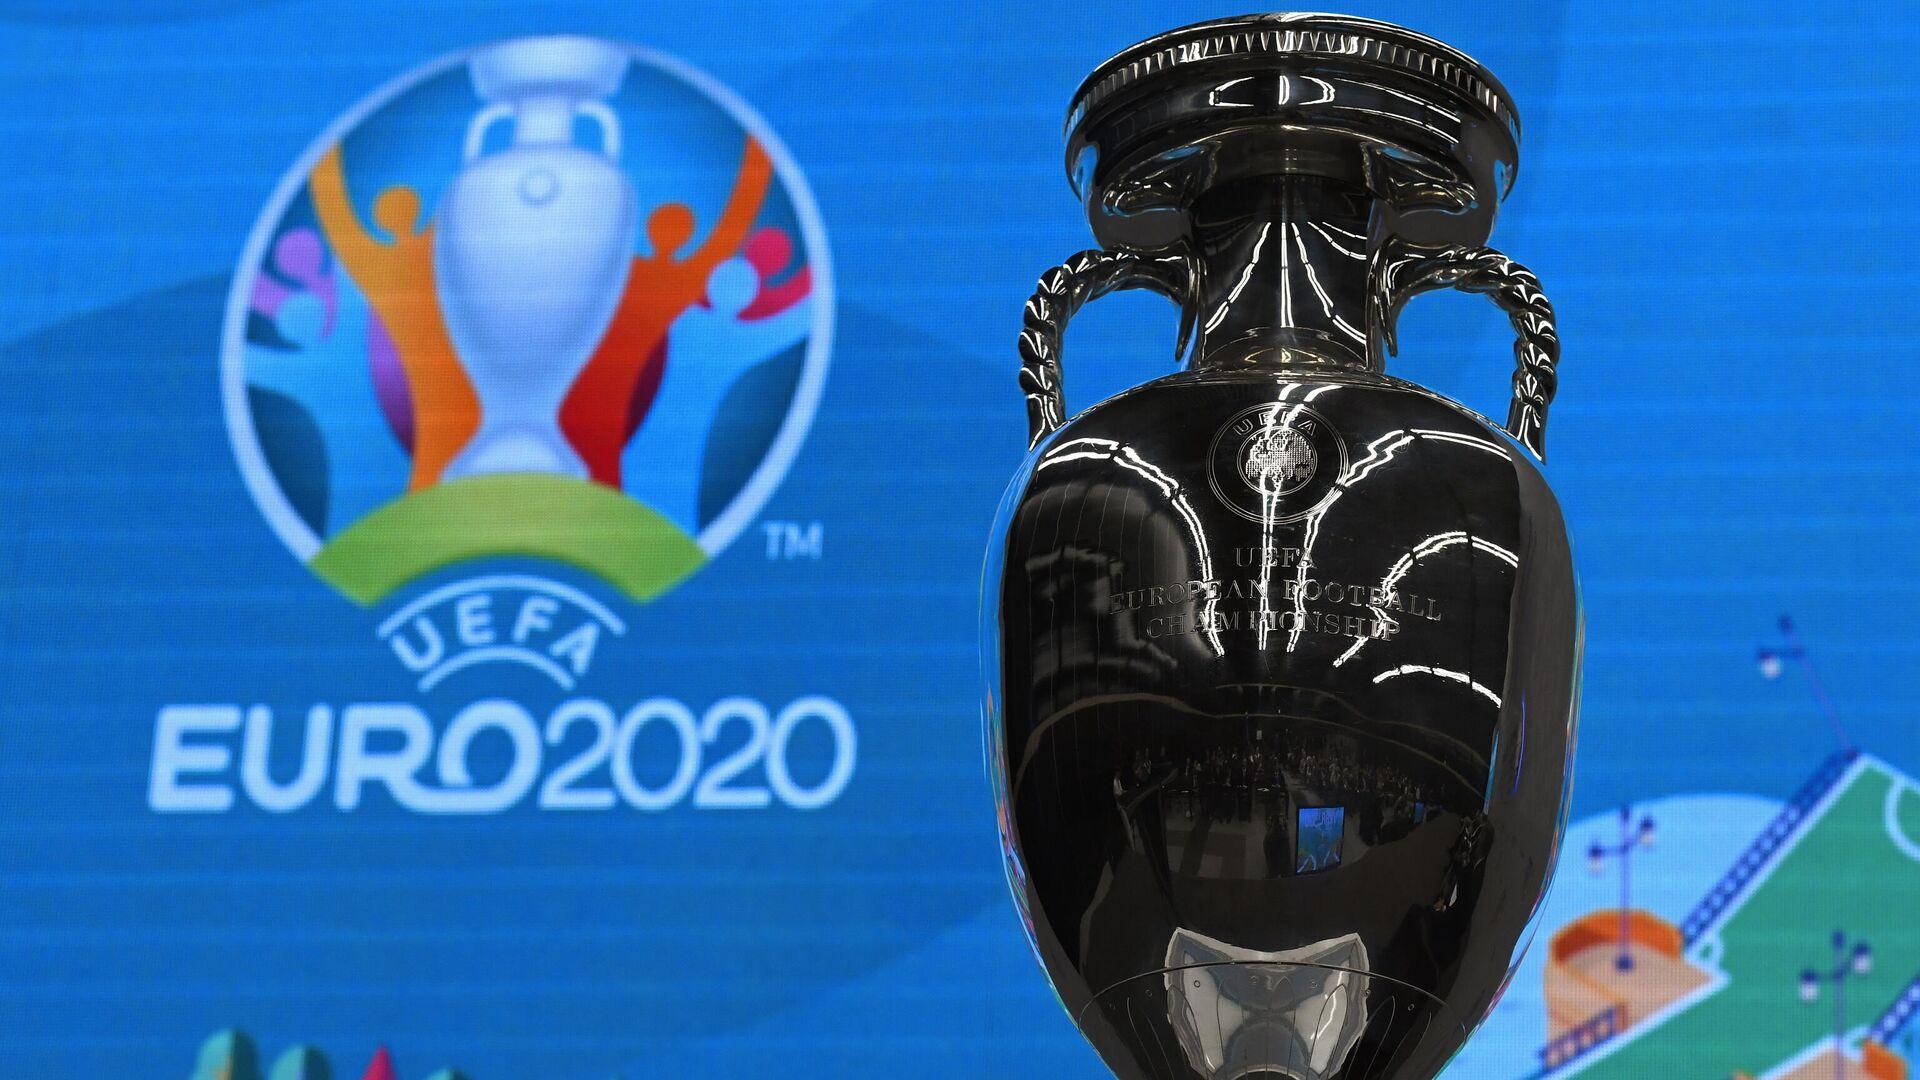 Кубок и логотип чемпионата Европы по футболу 2020 - РИА Новости, 1920, 15.02.2021